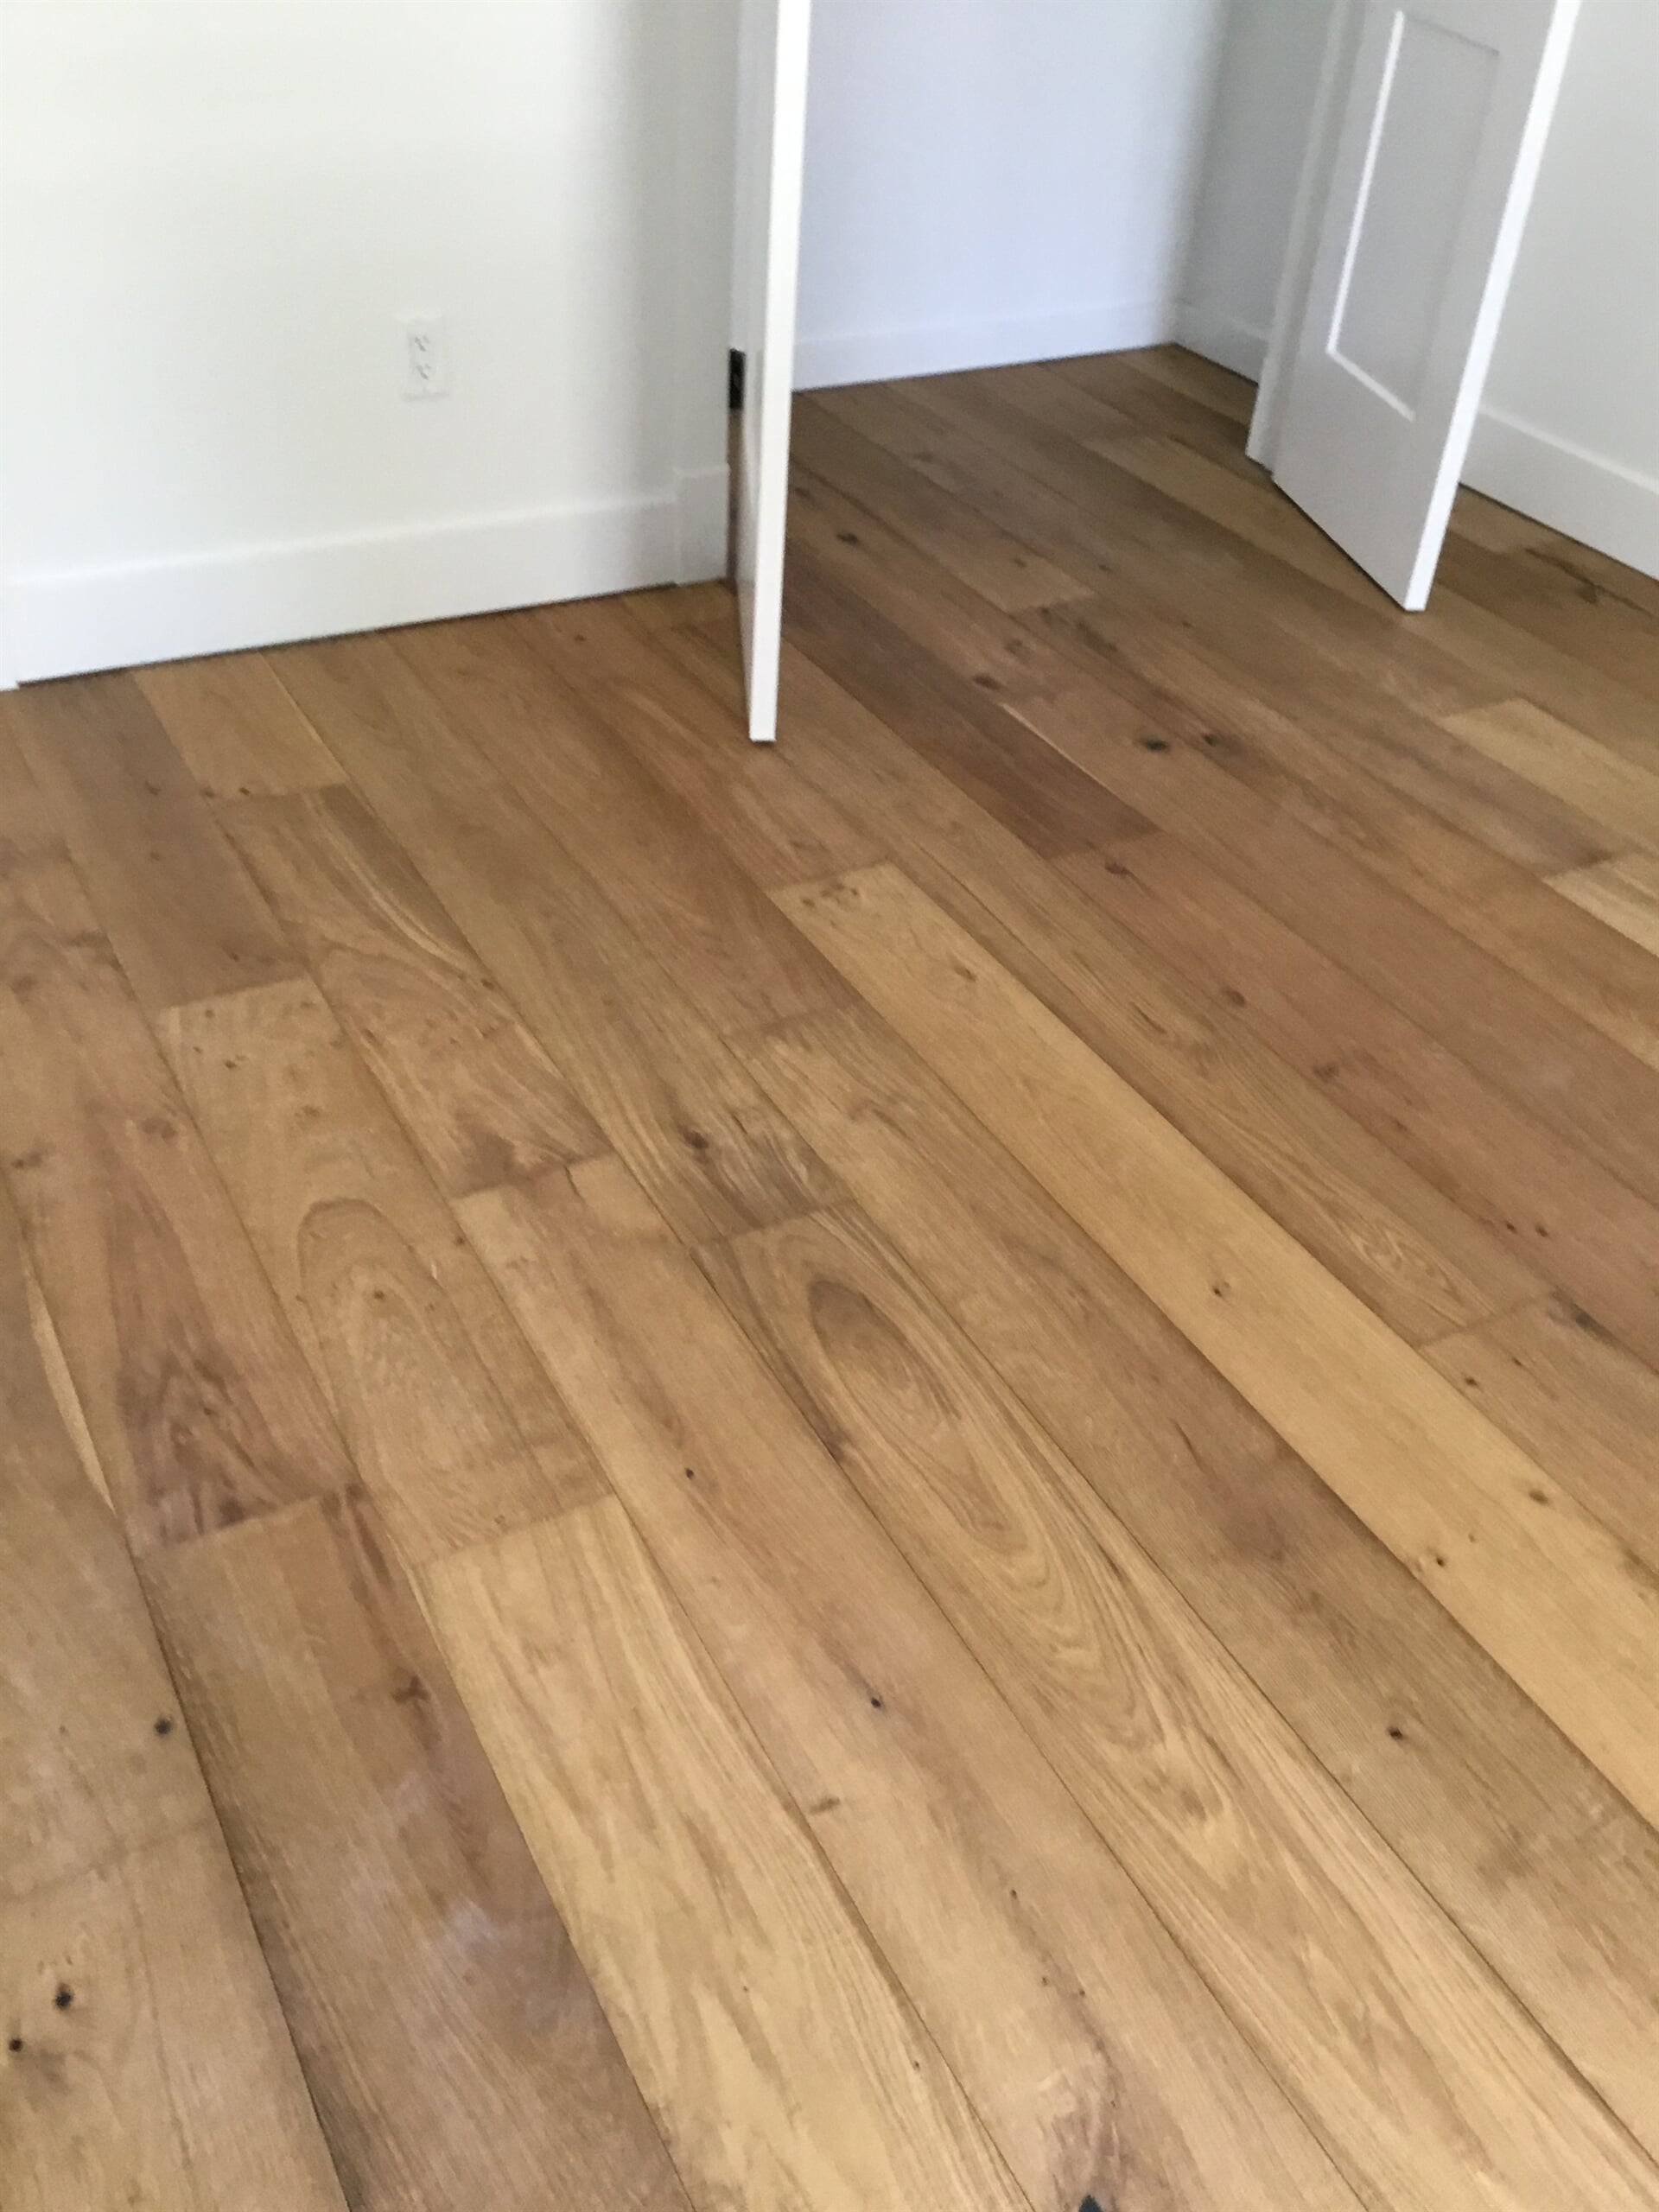 Hardwood flooring from Roop's Carpet in Searcy, AR